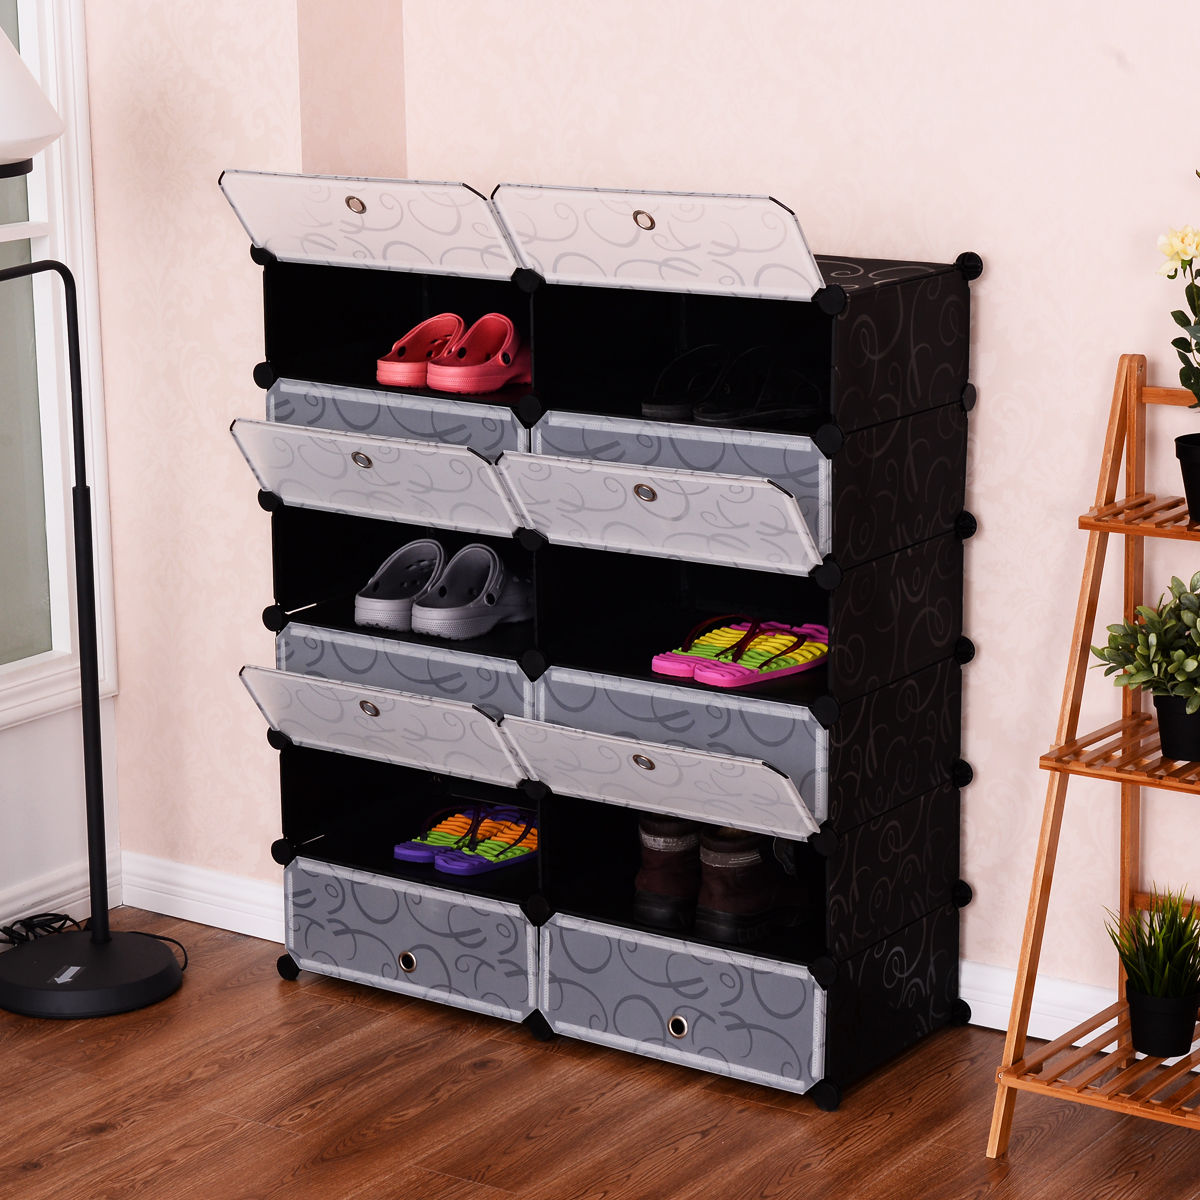 Giantex 12 Cubic Portable Shoe Rack Shelf Modern Waterproof Shoes Cabinet Storage Closet Organizer Home Furniture Hw54796